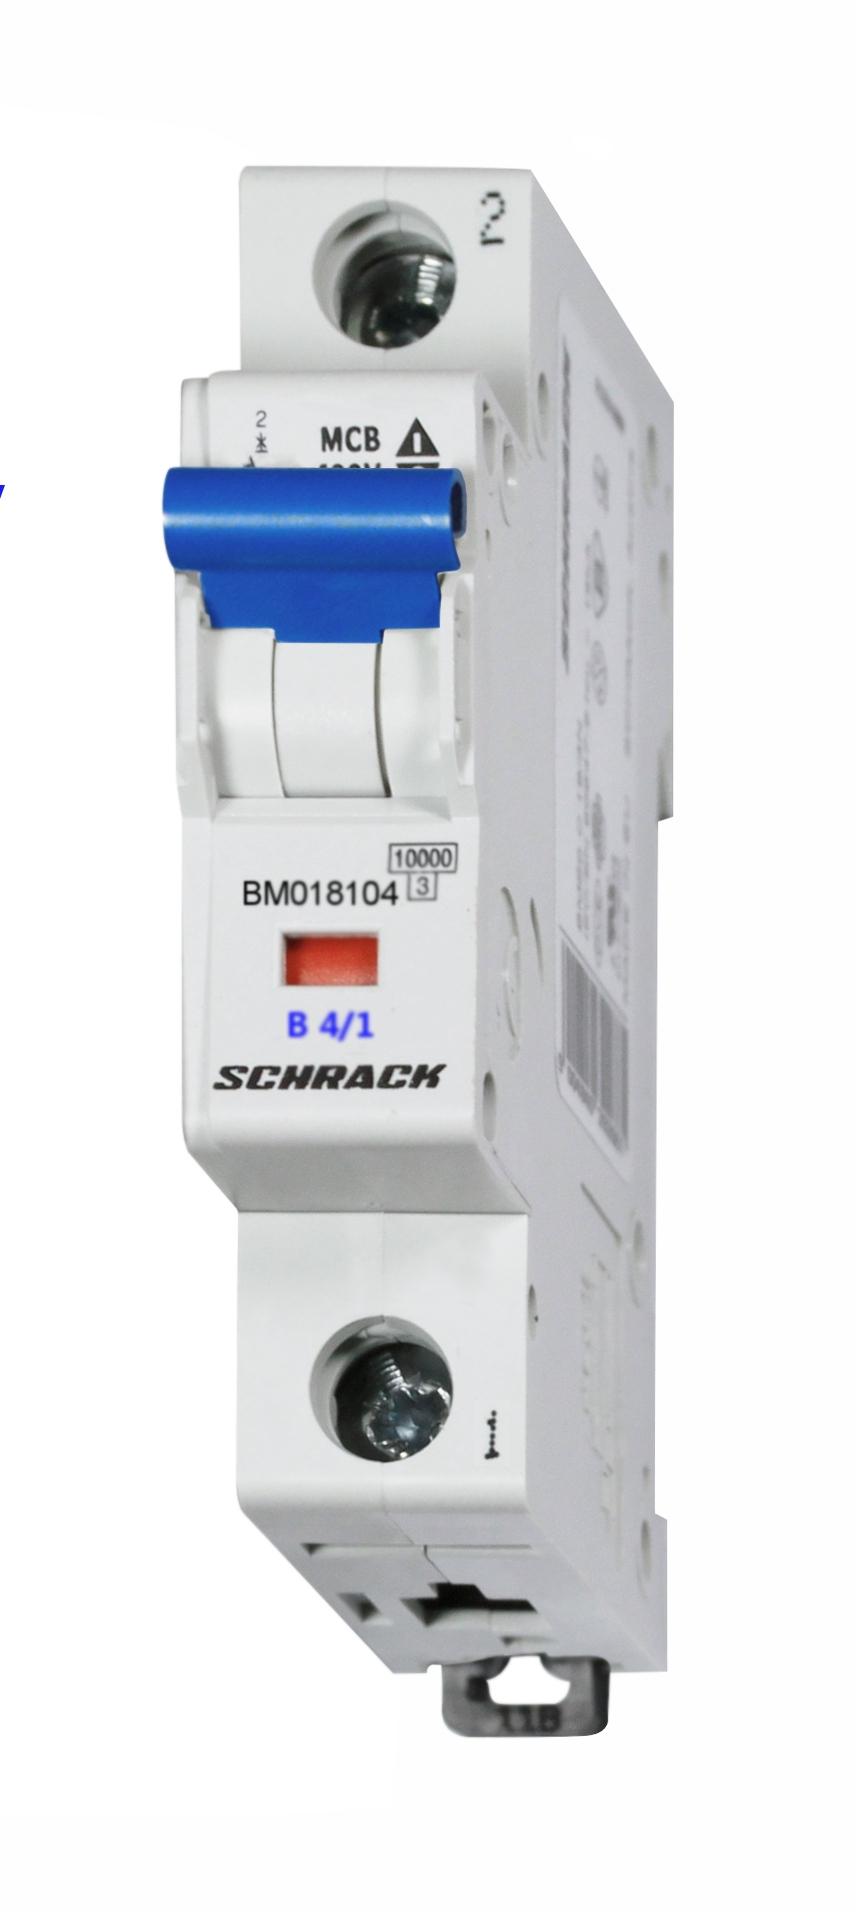 BM018104 - Schrack Technik